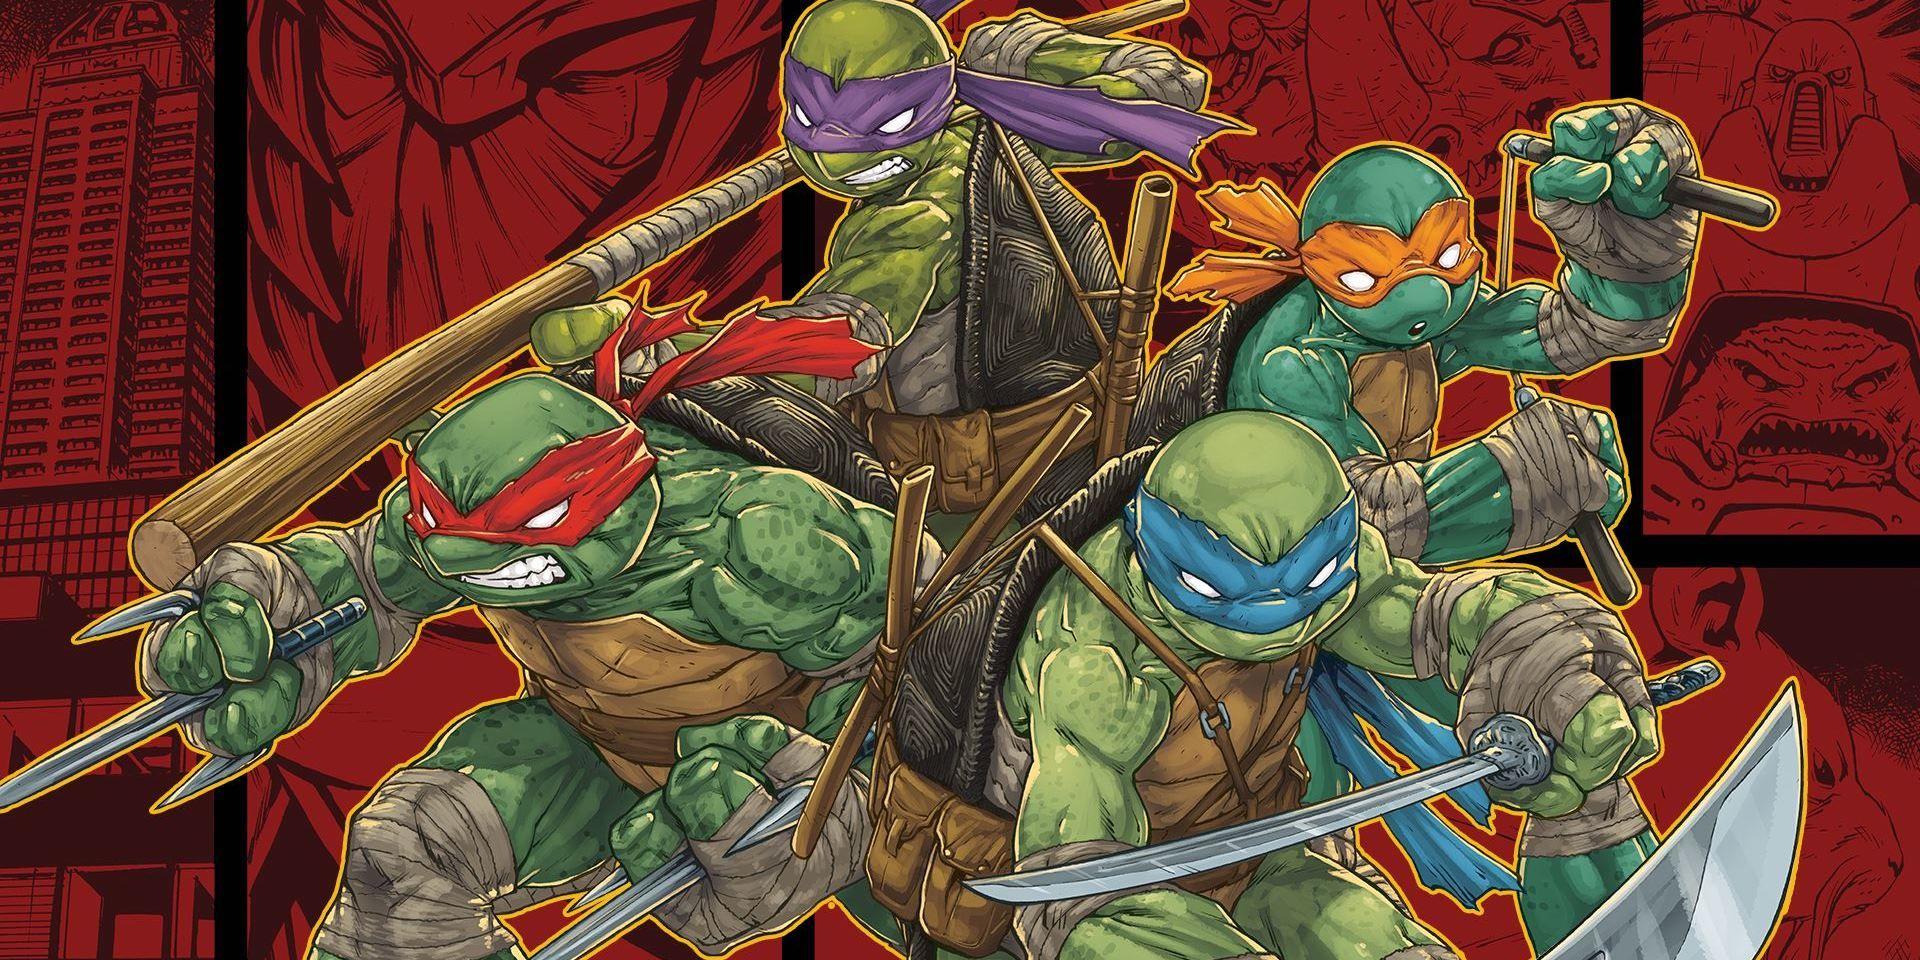 It is an image of Agile Teenage Ninja Turtle Pictures